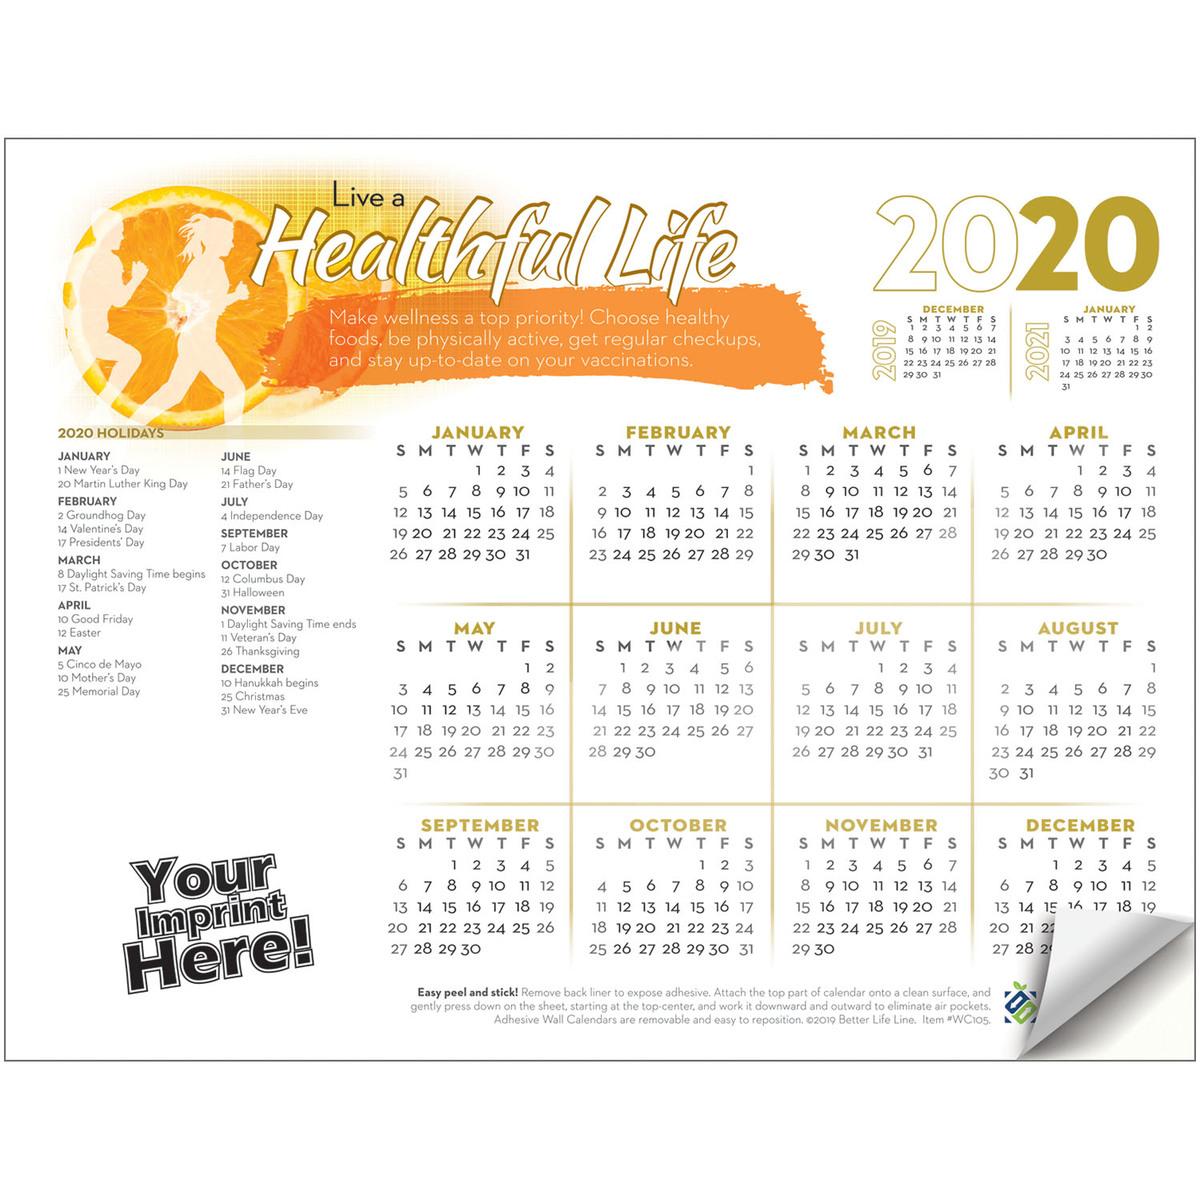 Adhesive Wall Calendar - 2020 Live A Healthful Life (Health & Wellness)